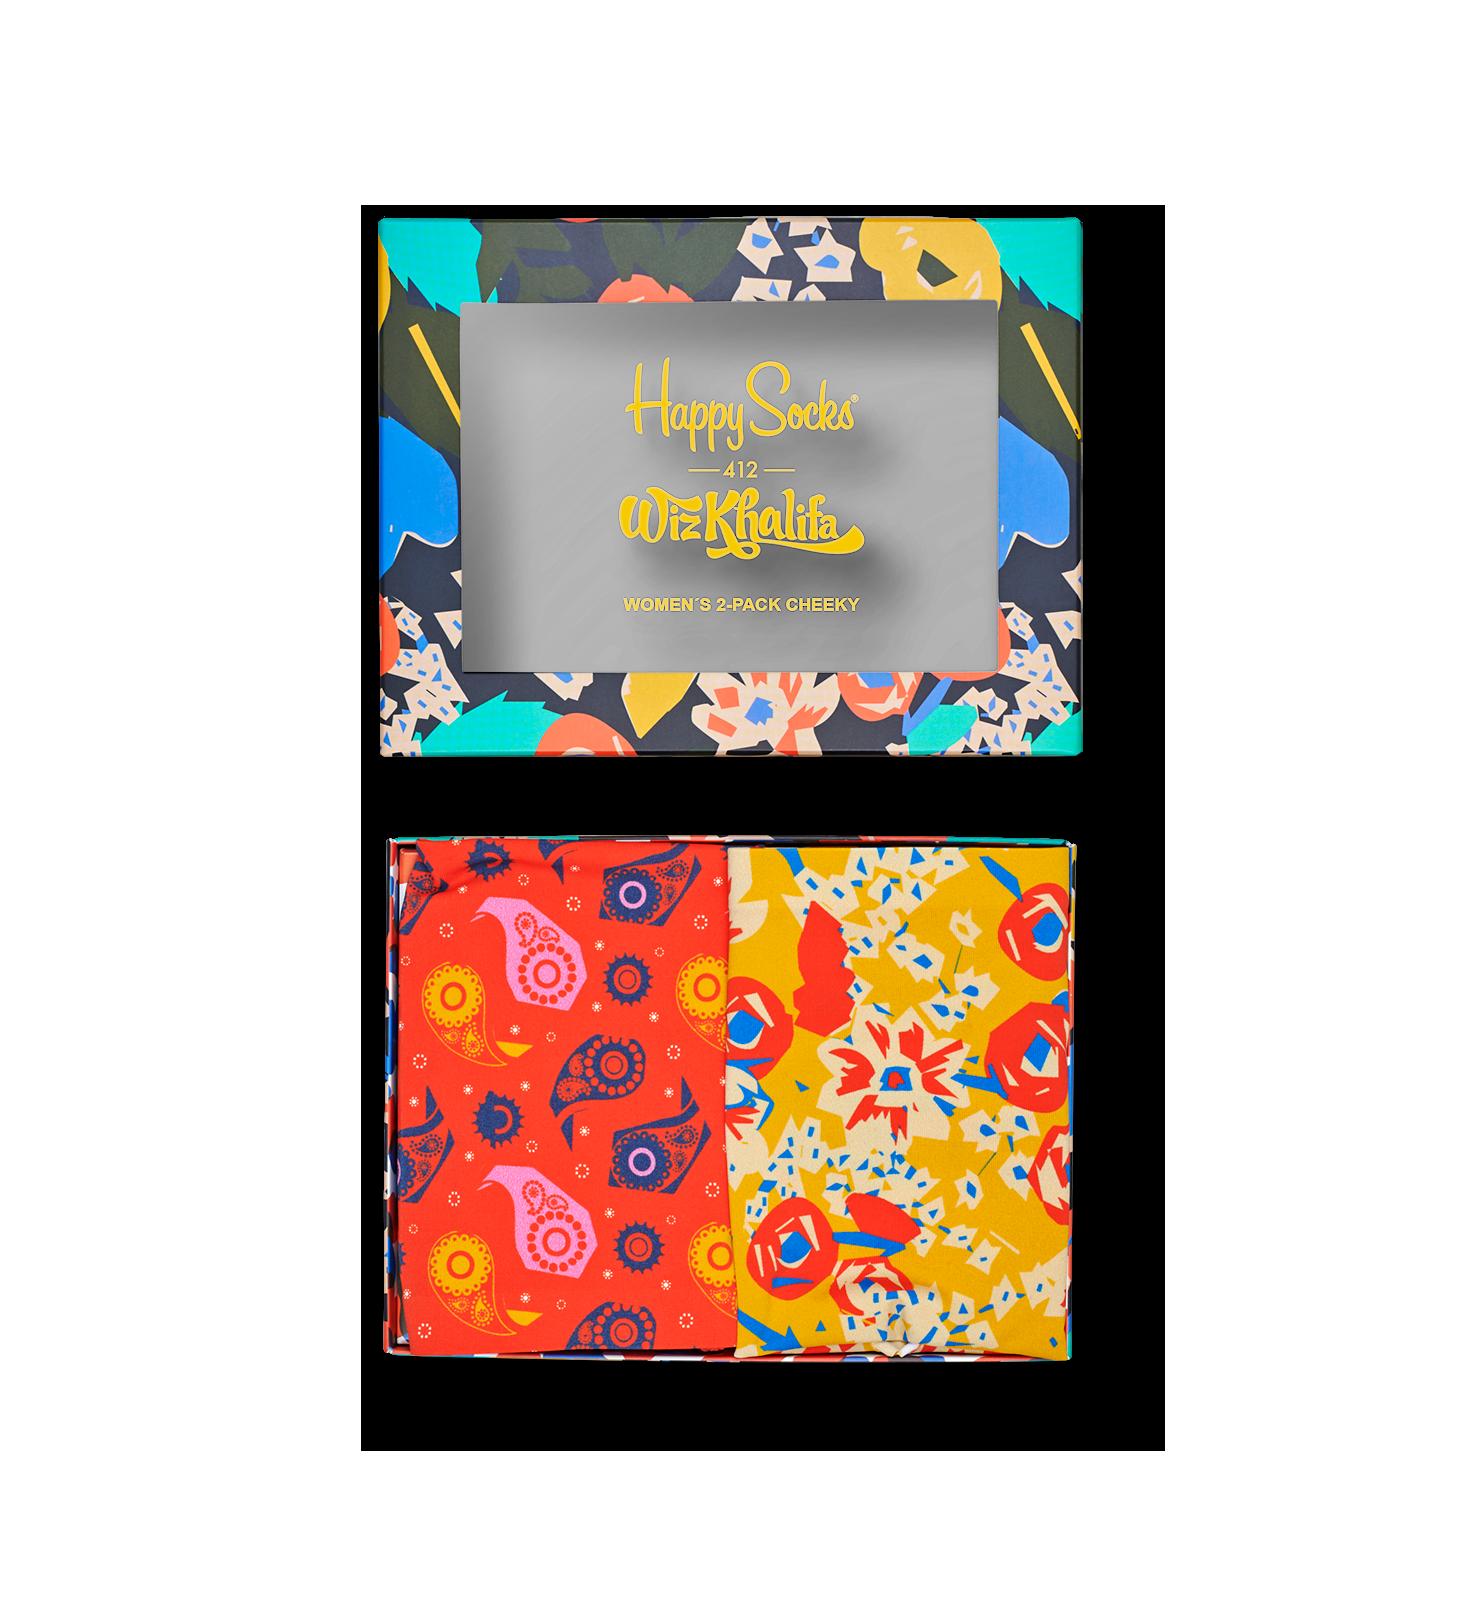 2-Pack Wiz Khalifa Cheeky Box Set